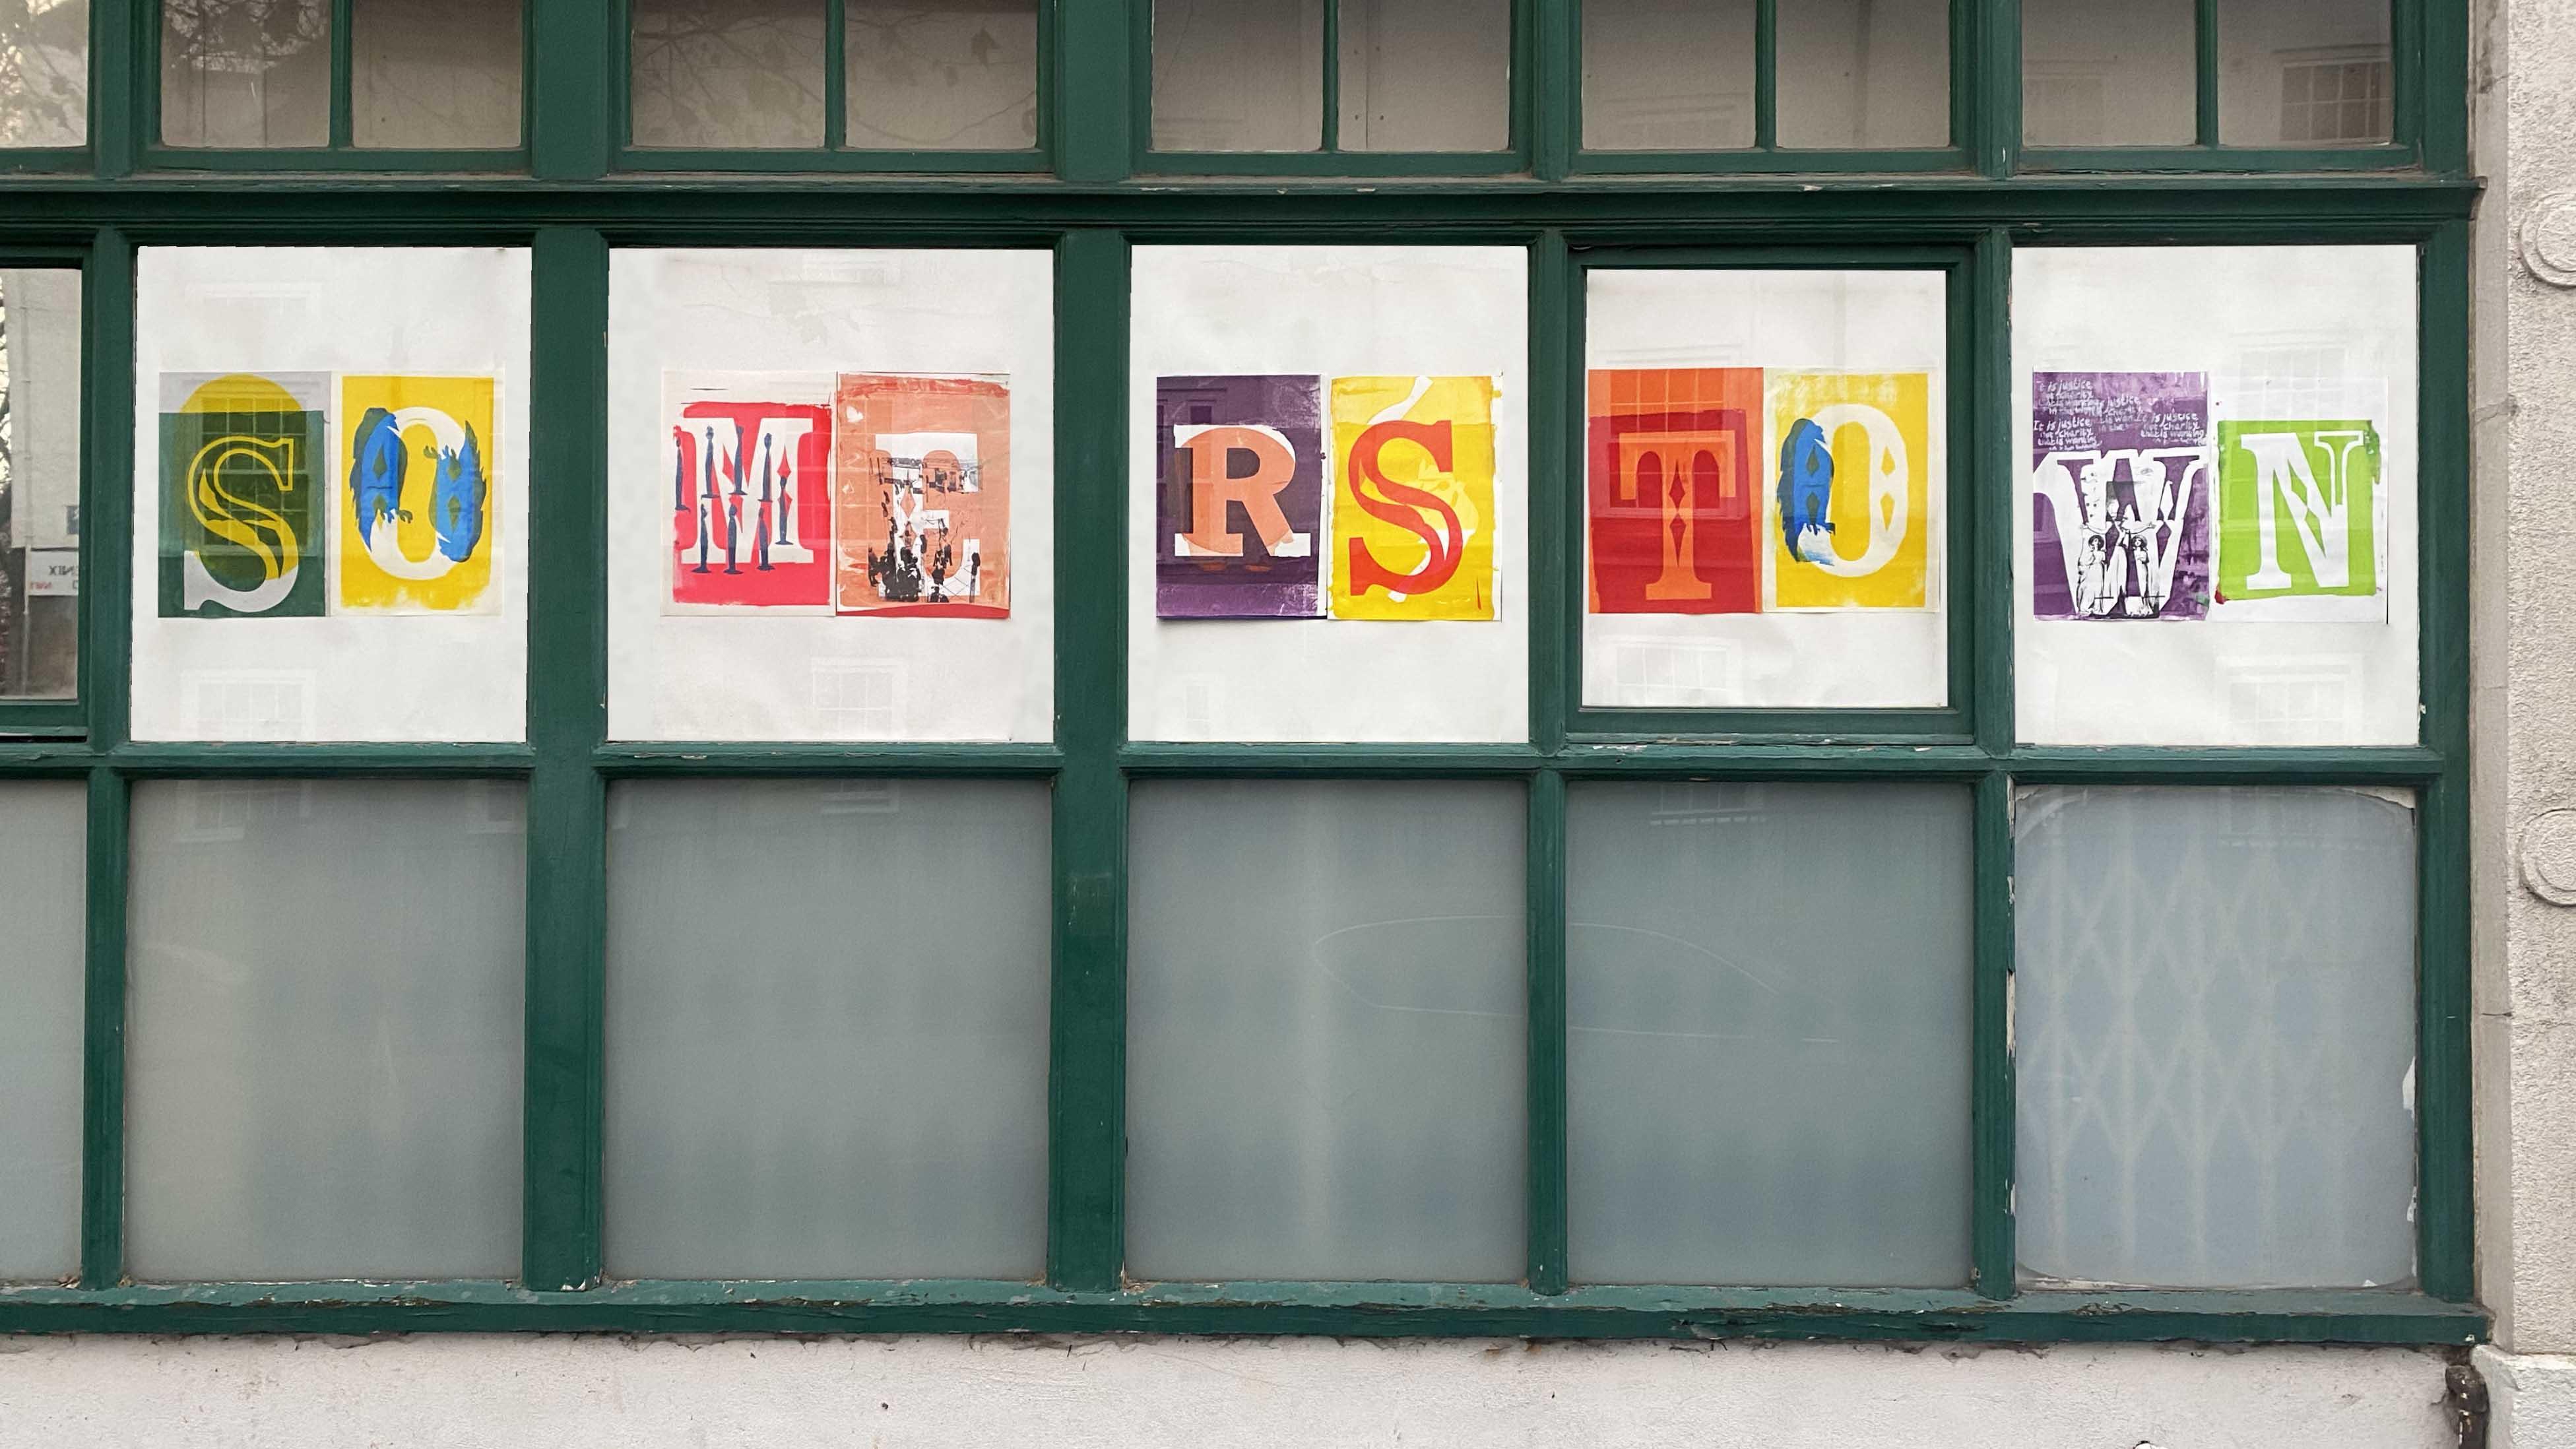 Screenprints displayed in a window